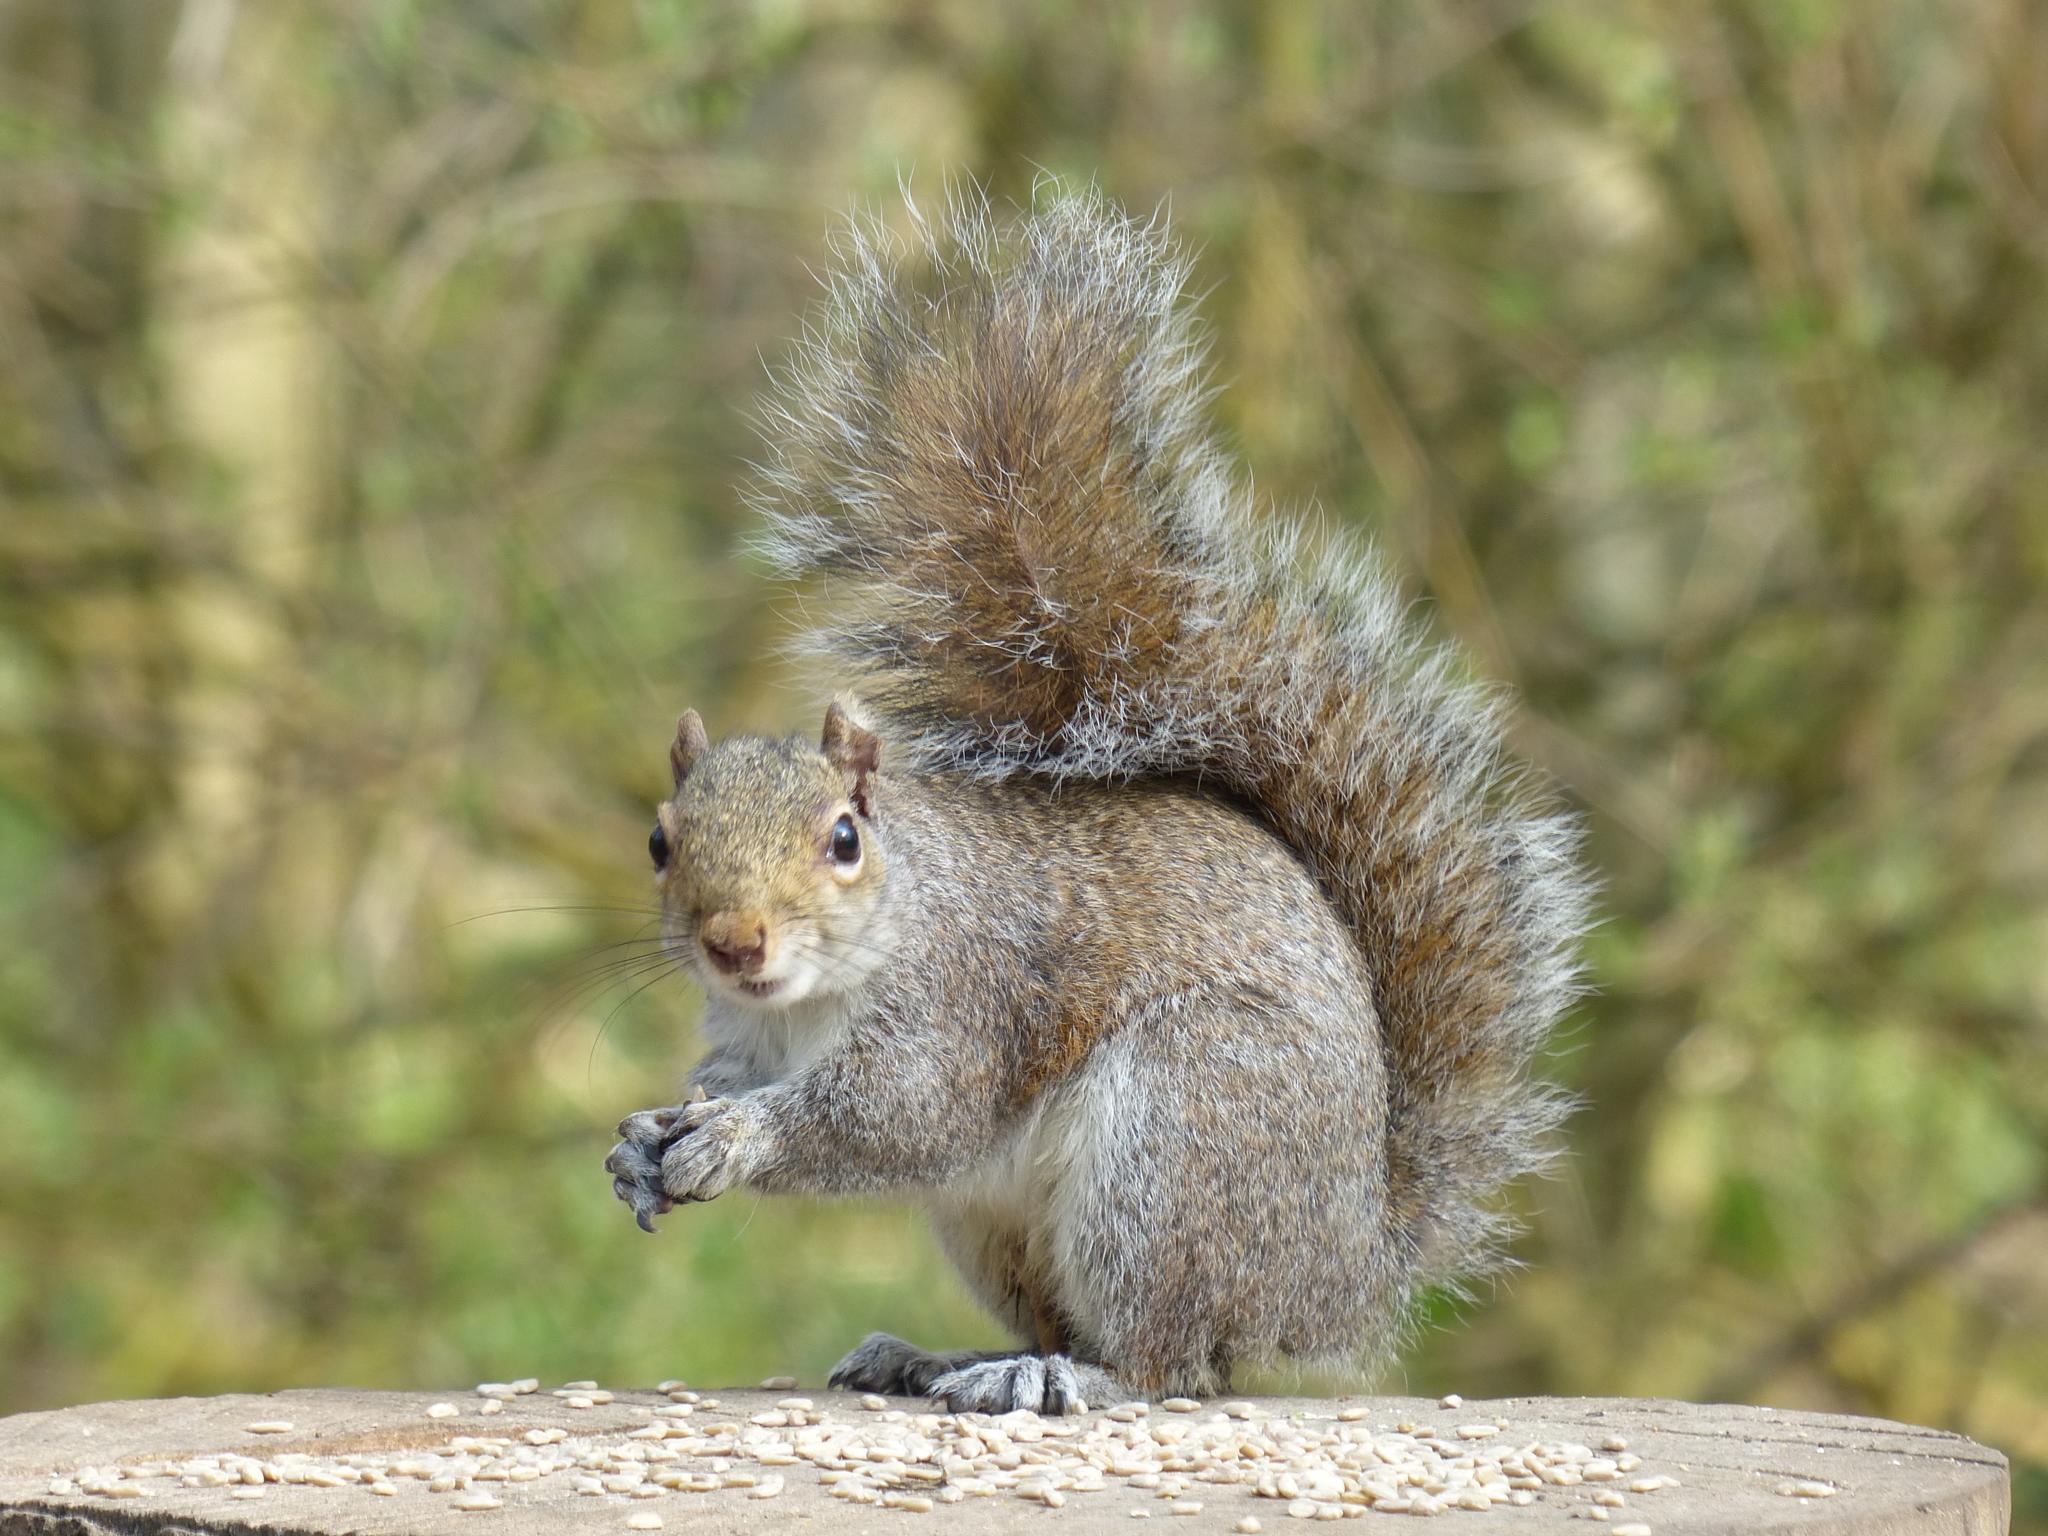 Squirrel by wendy.west.9212